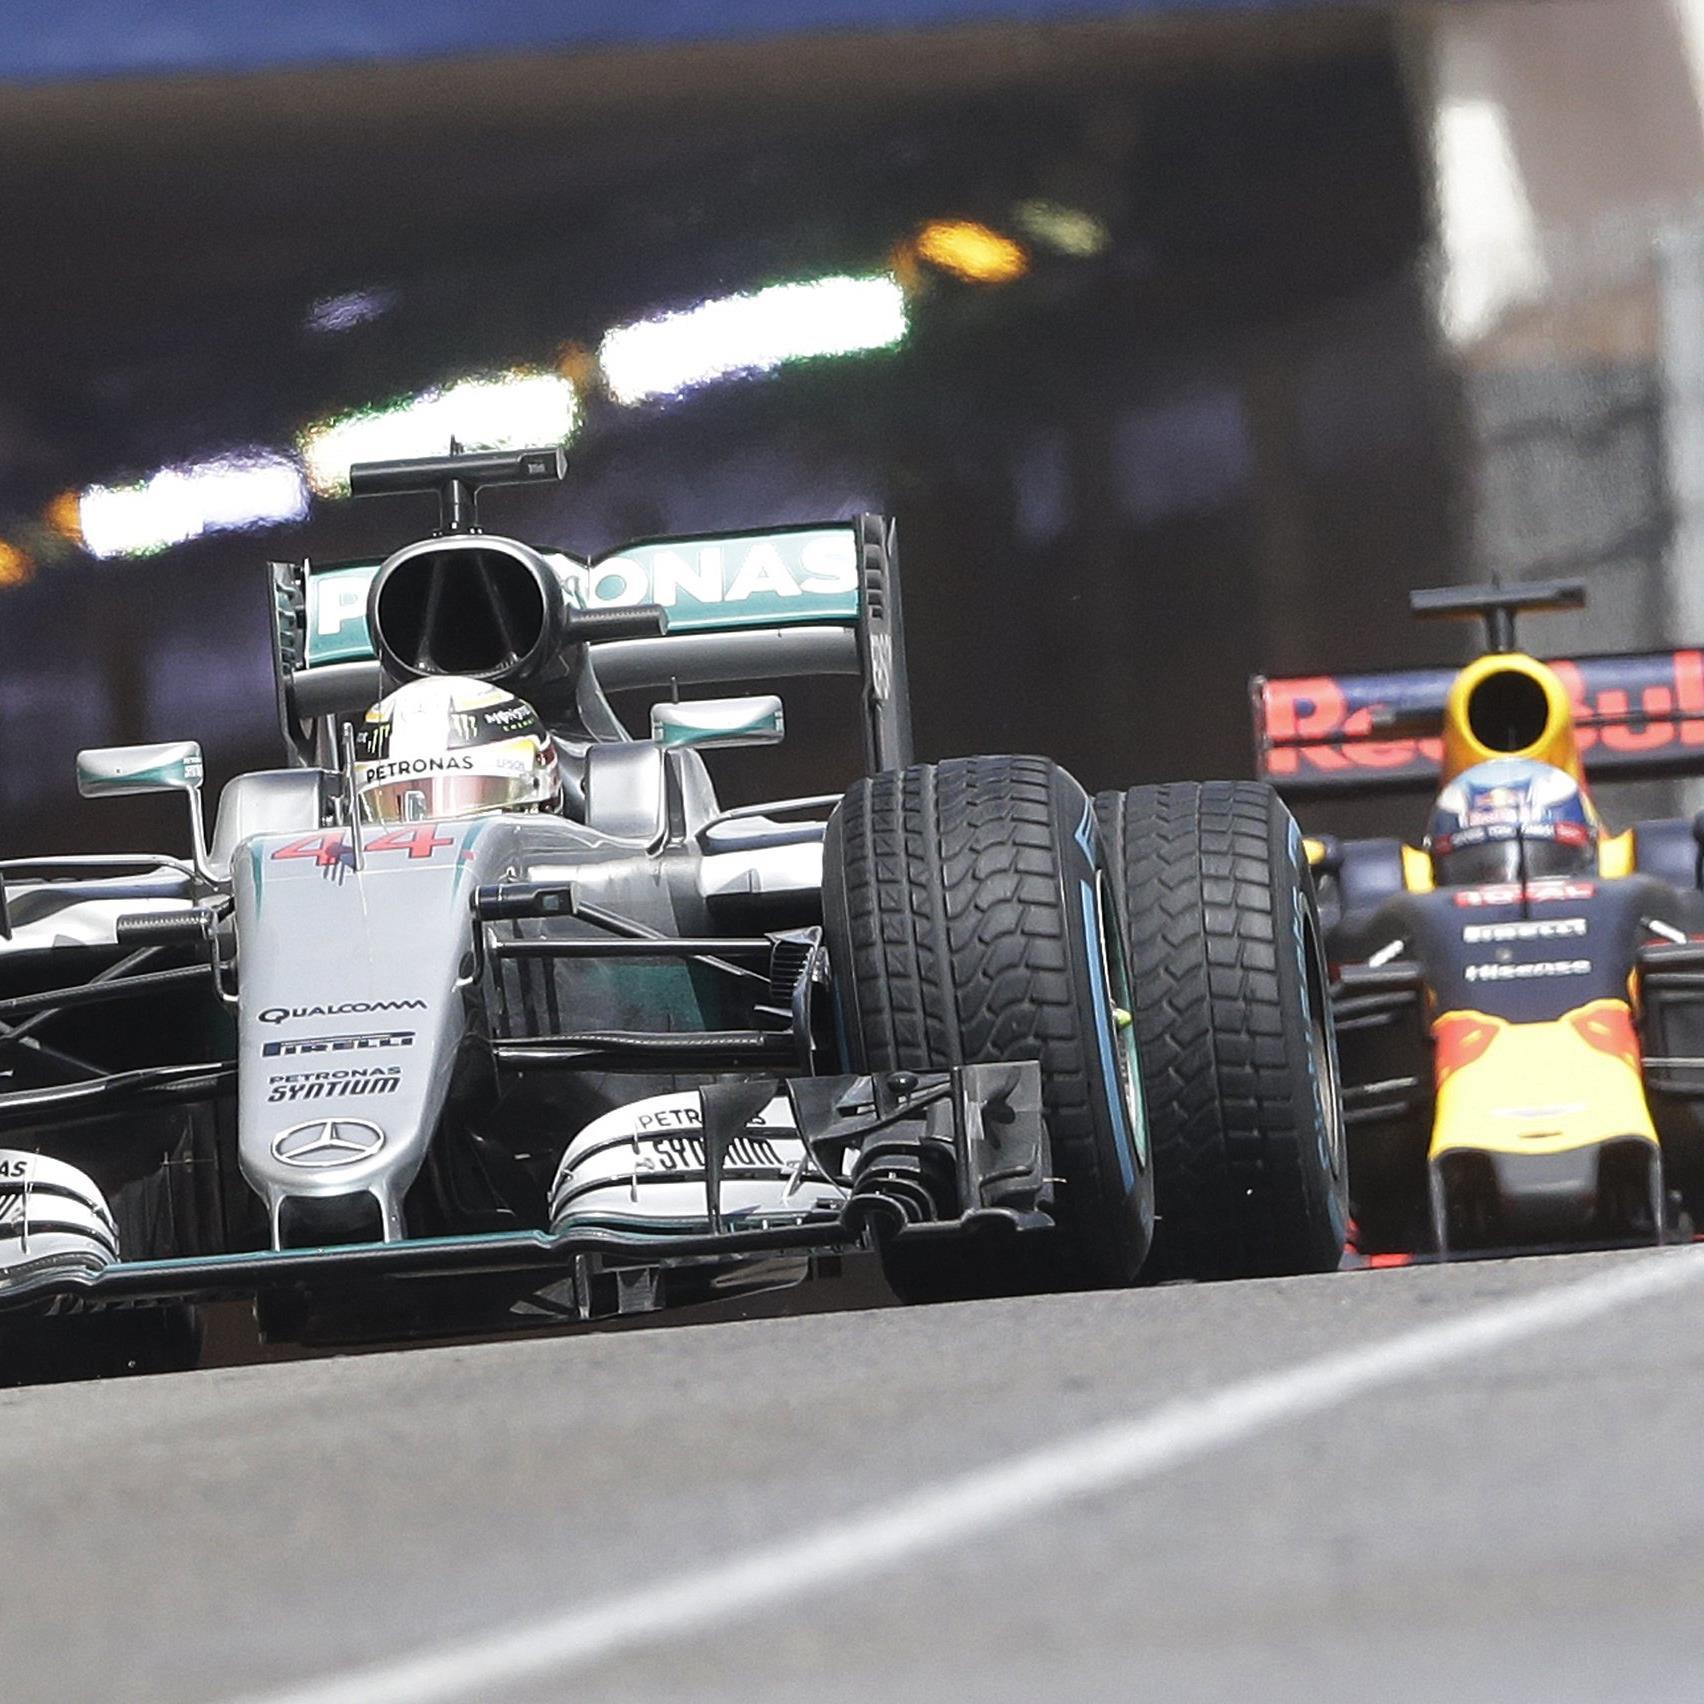 Wenig Freude bei Daniel Ricciardo über Platz zwei im Grand Prix von Monaco.